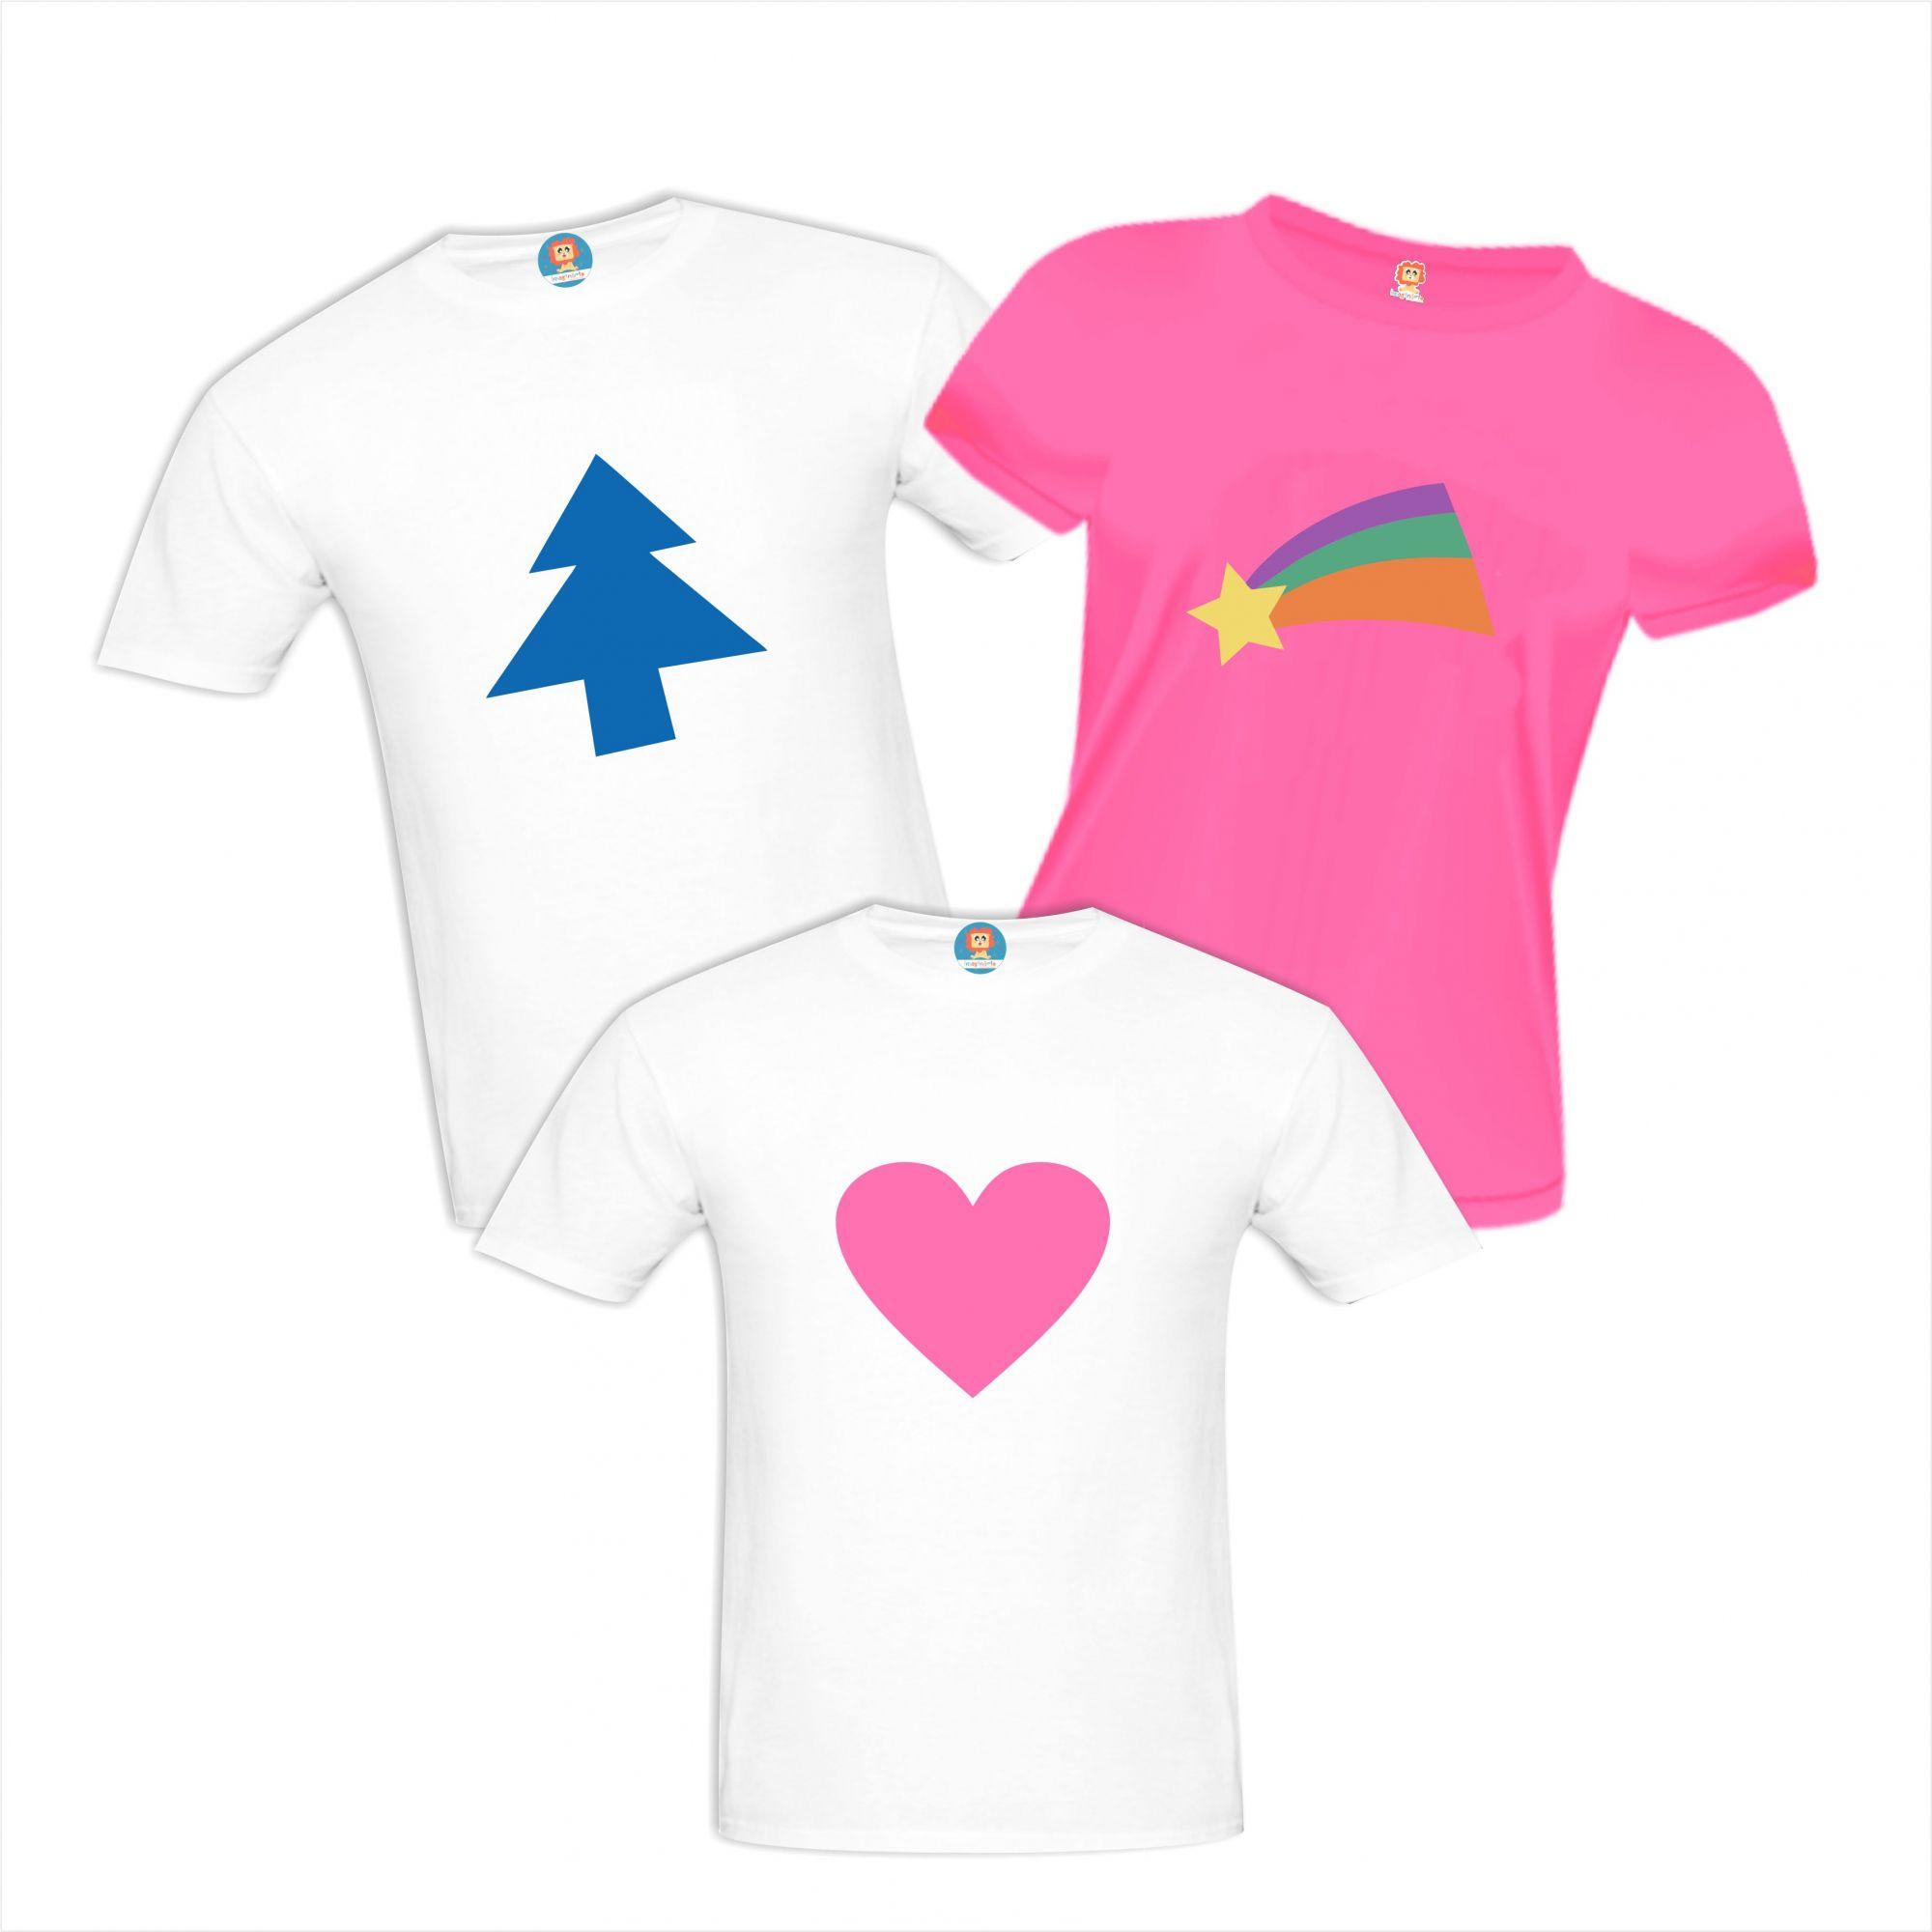 Camisetas de Aniversário Gravity Falls